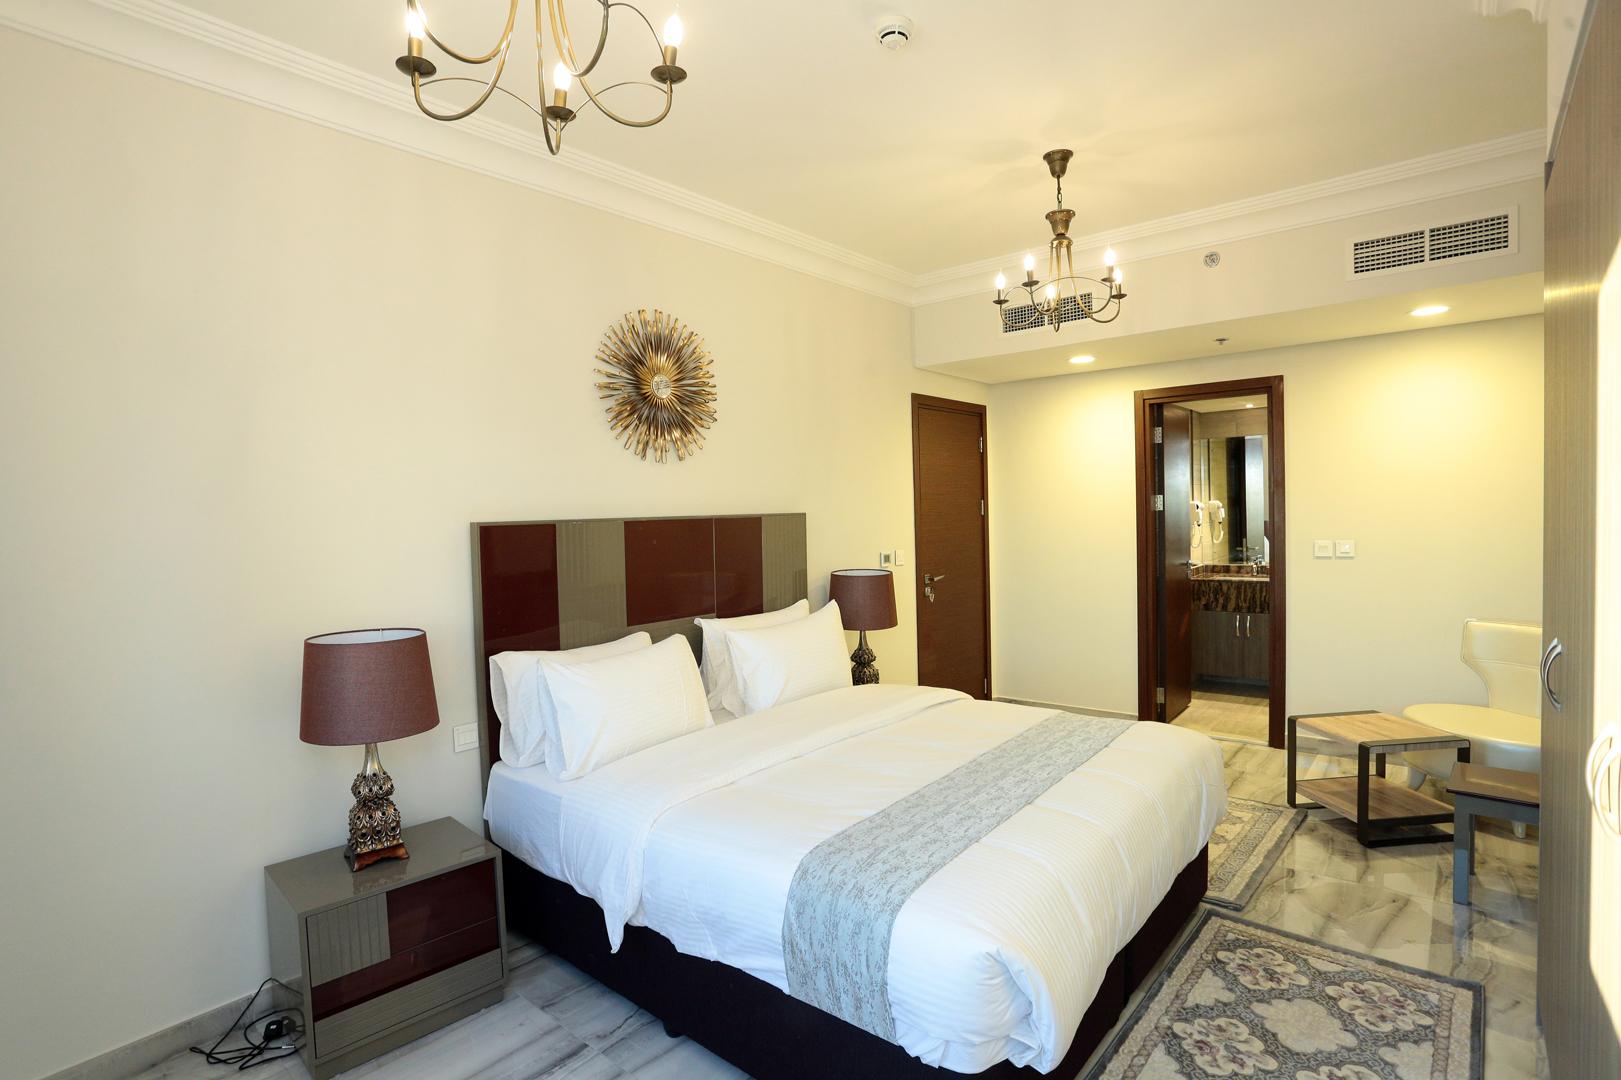 Marbella Luxury 2 bedrooms photo 27263079